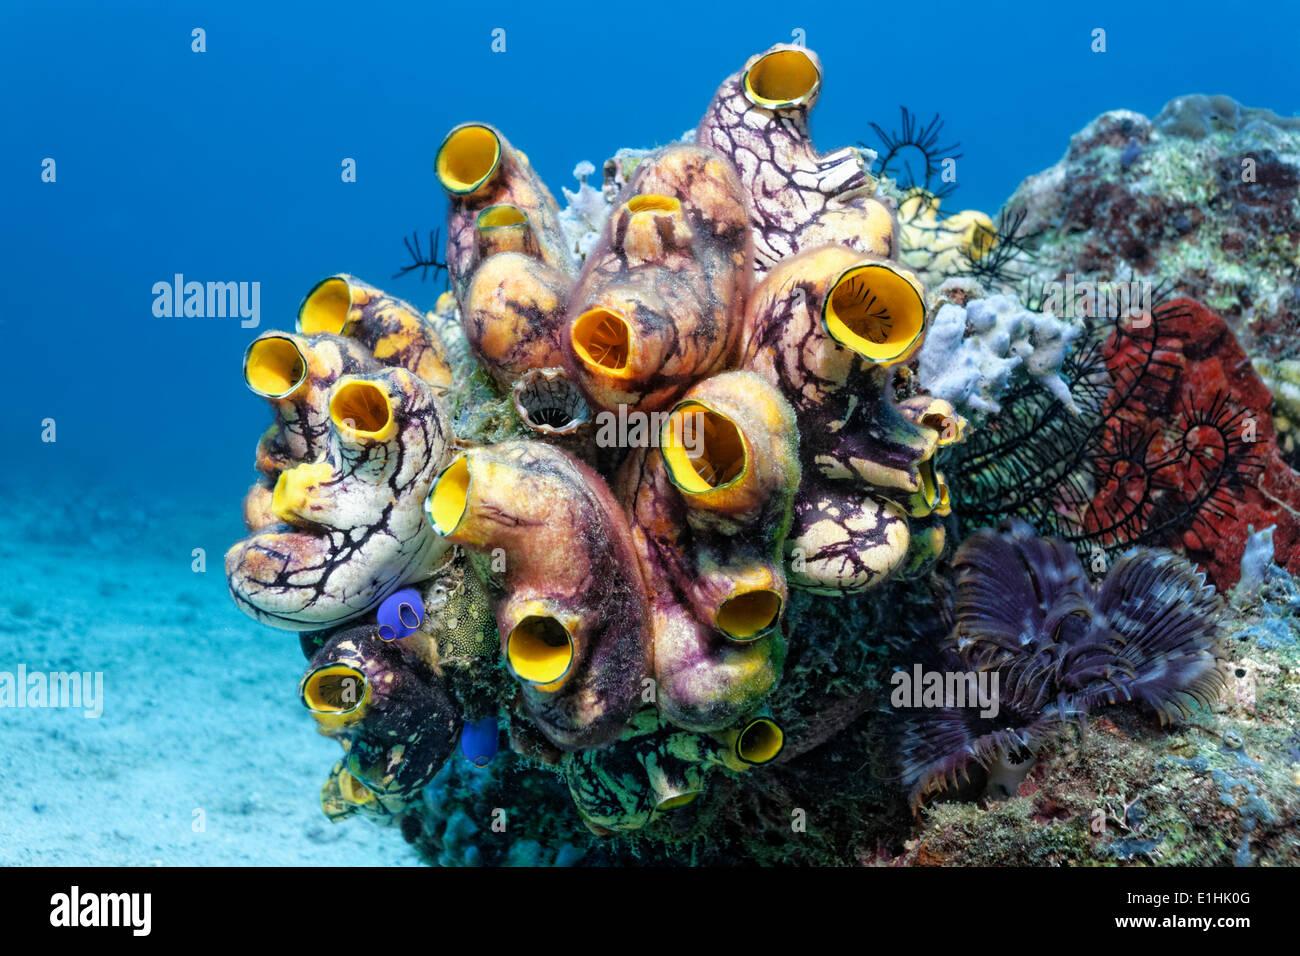 Colony of Polycarpa-Sea Squirts (Polycarpa aurata) on a coral reef, Sabang Beach, Puerto Galera, Mindoro Island, Philippines - Stock Image